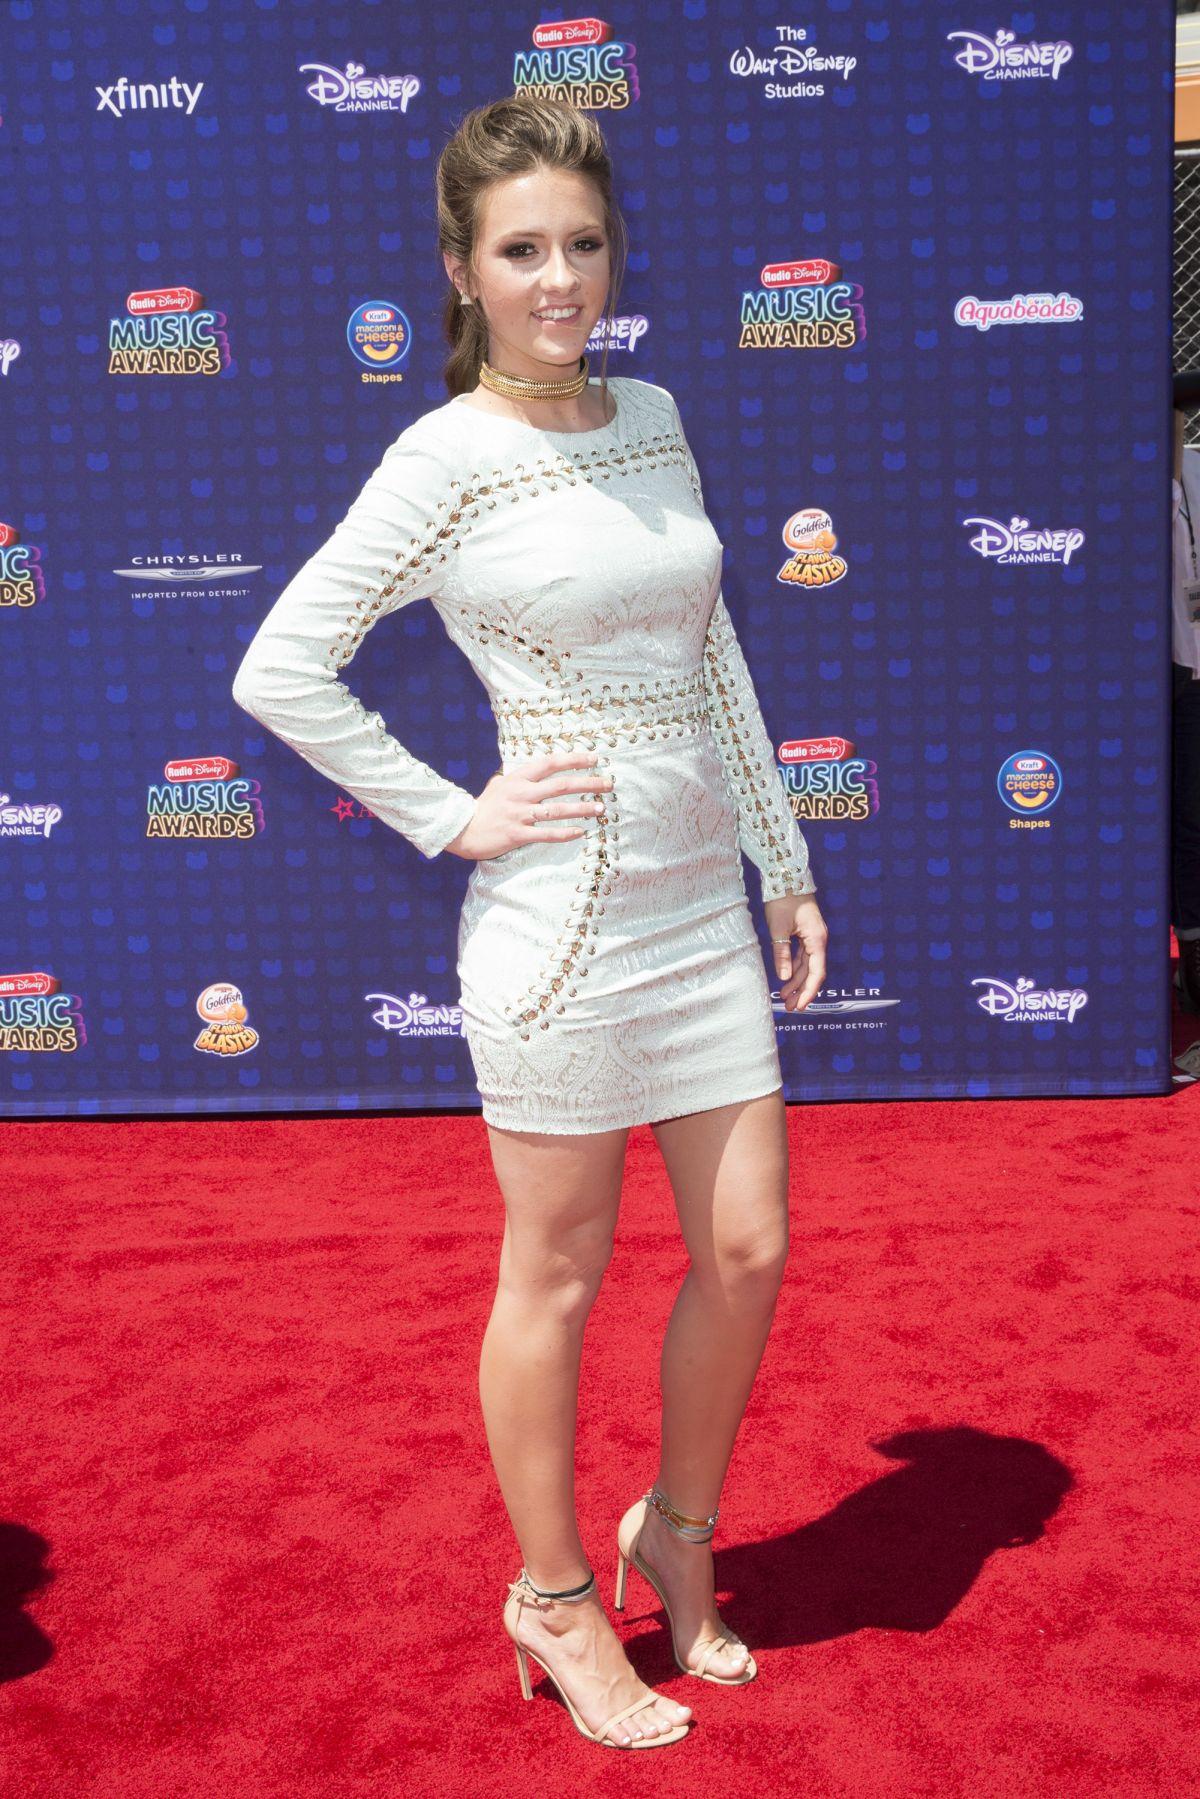 MAGGIE BAUGH at 2017 Radio Disney Music Awards in Los Angeles 04/29/2017